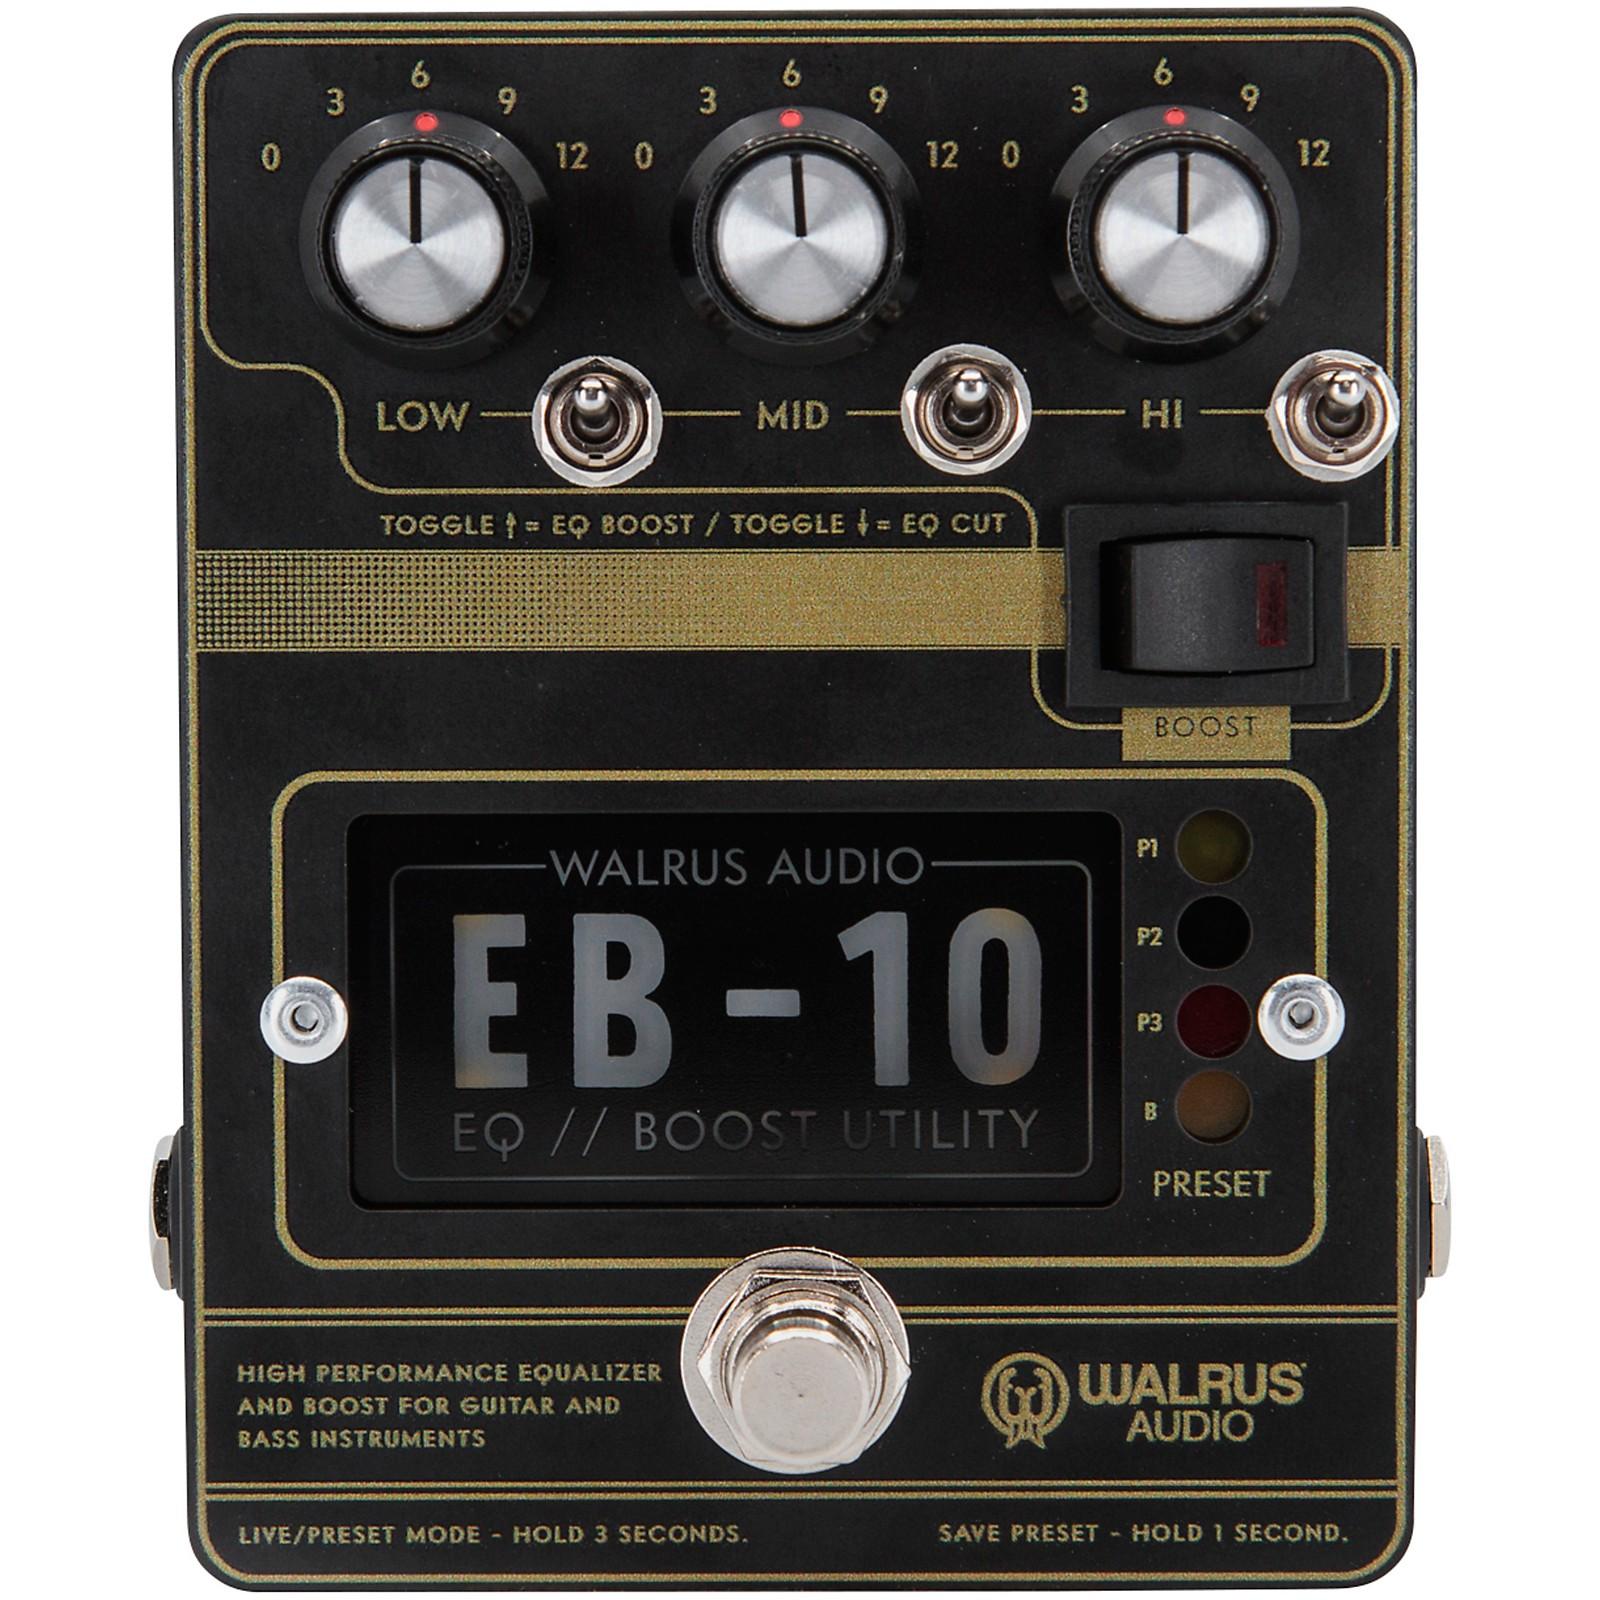 Walrus Audio EB-10 Preamp/EQ/Boost Effects Pedal